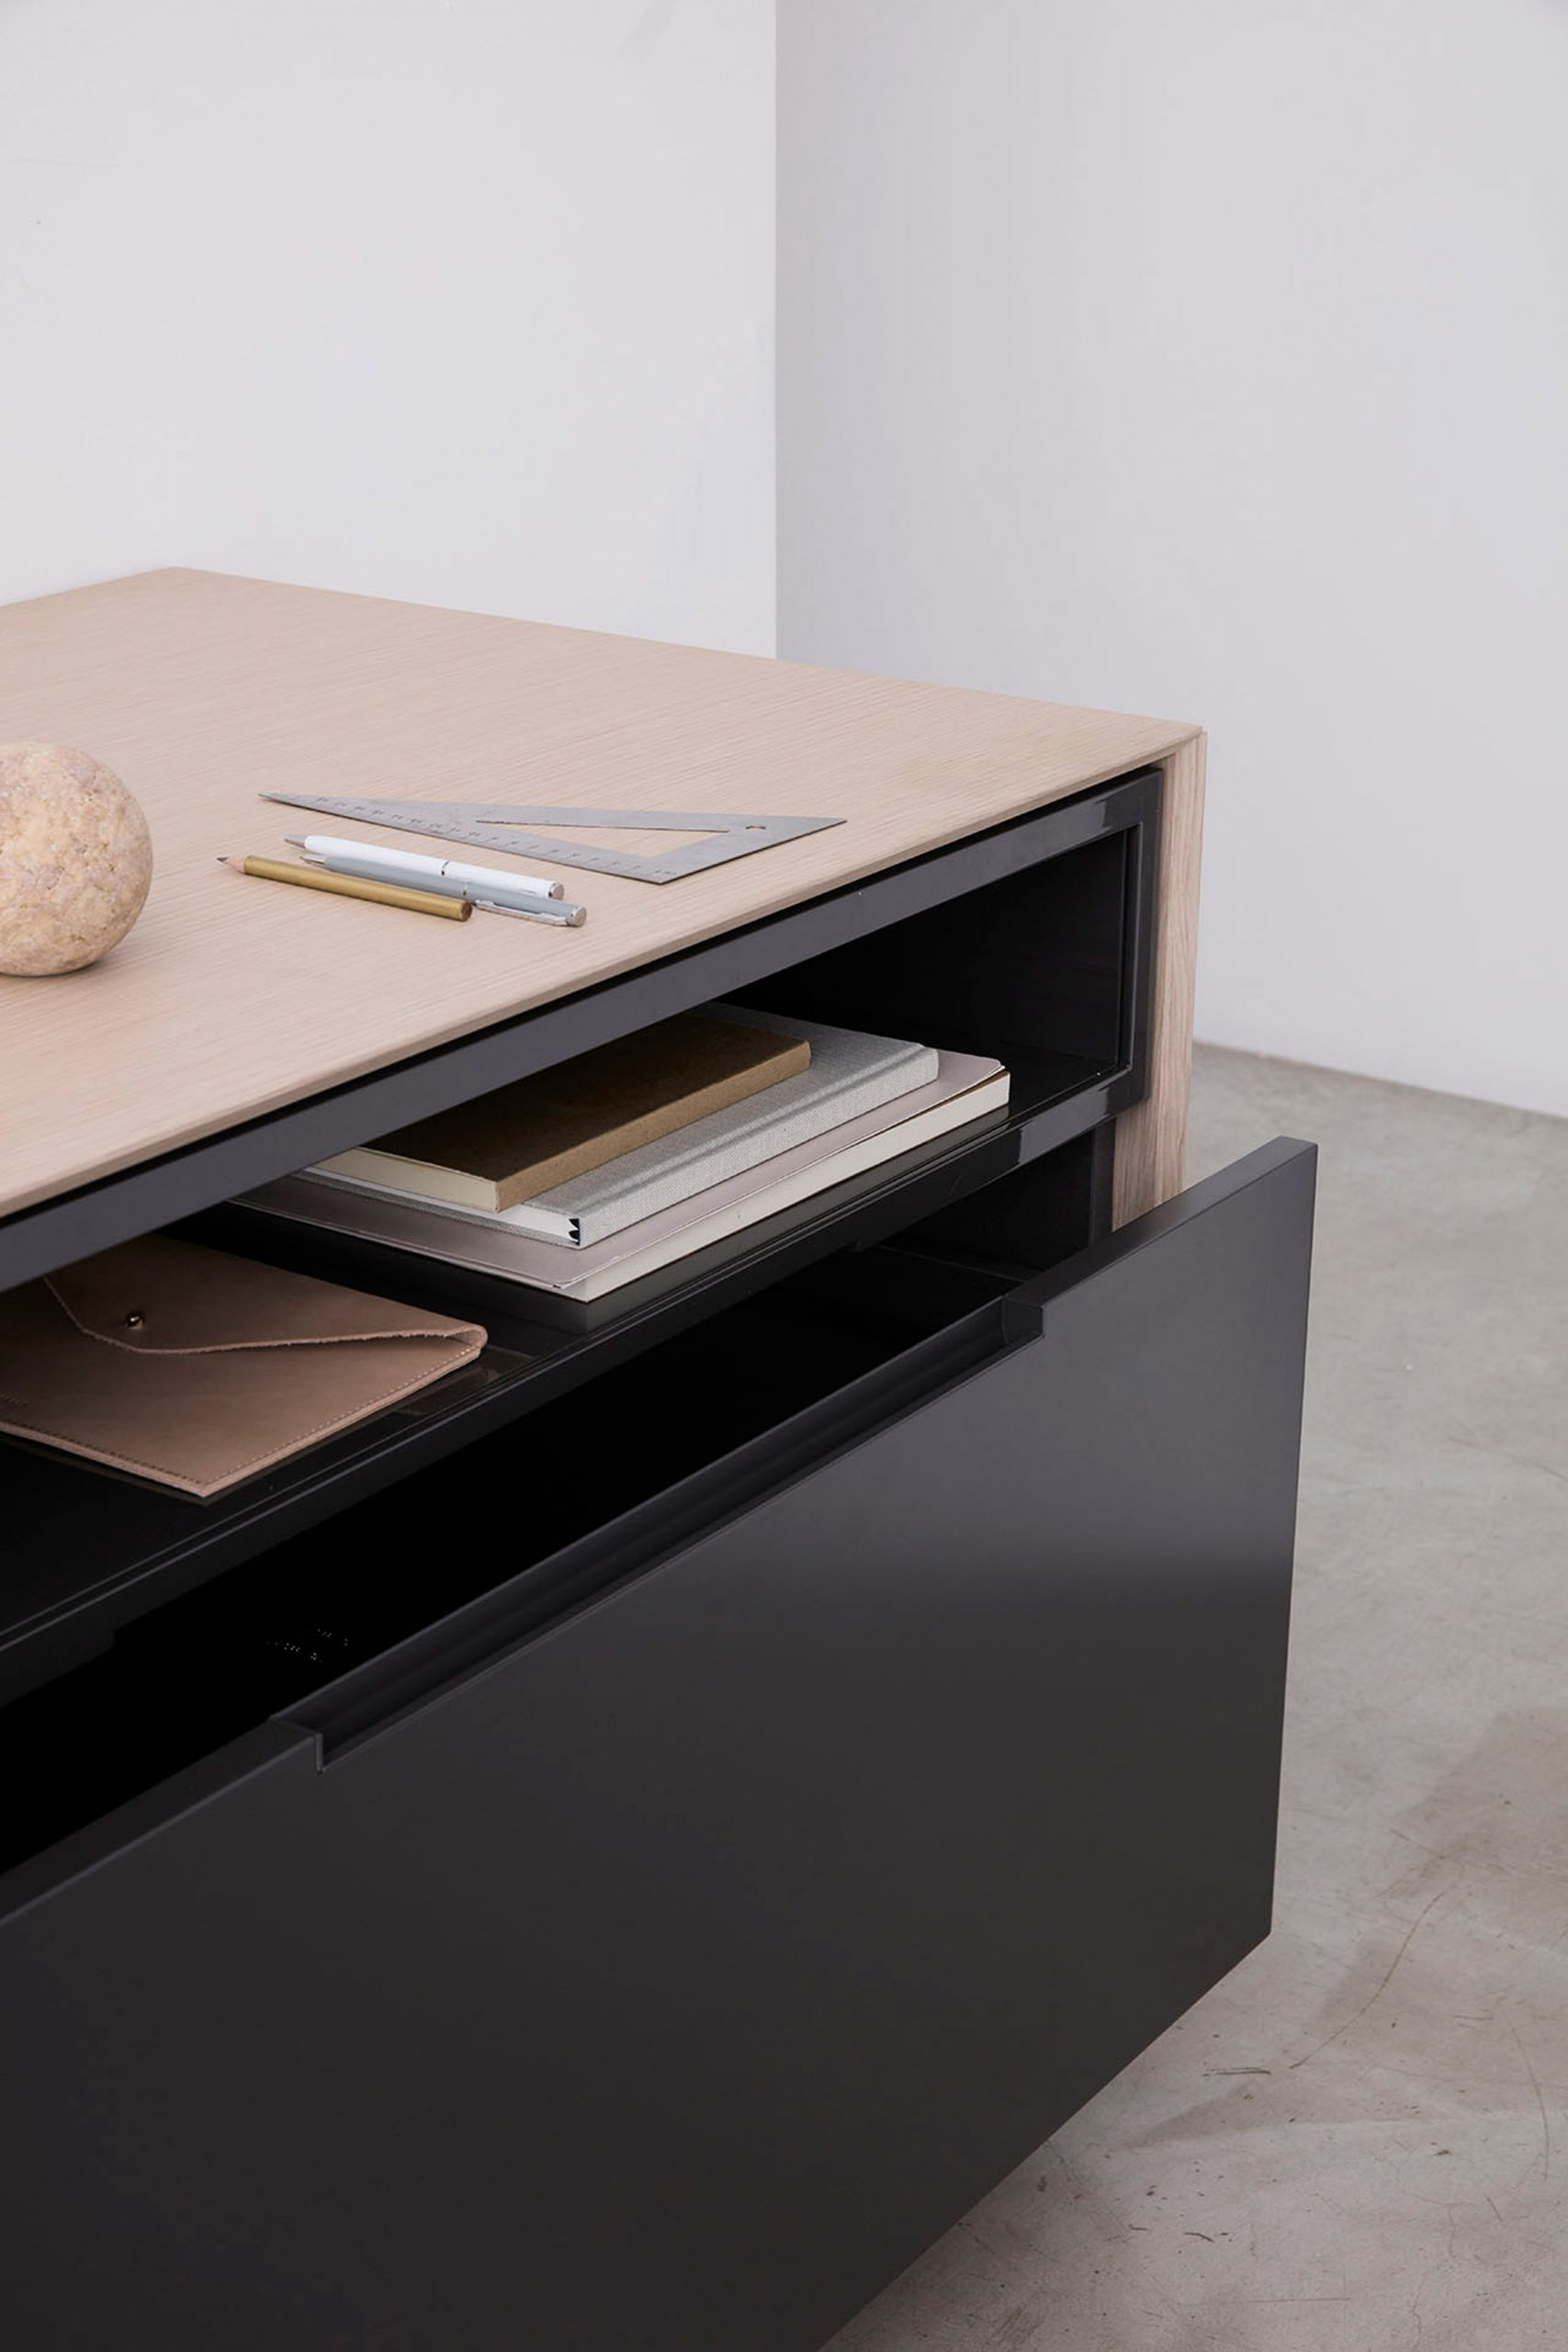 Brera25 desk by Gensler for IOC Project Partners